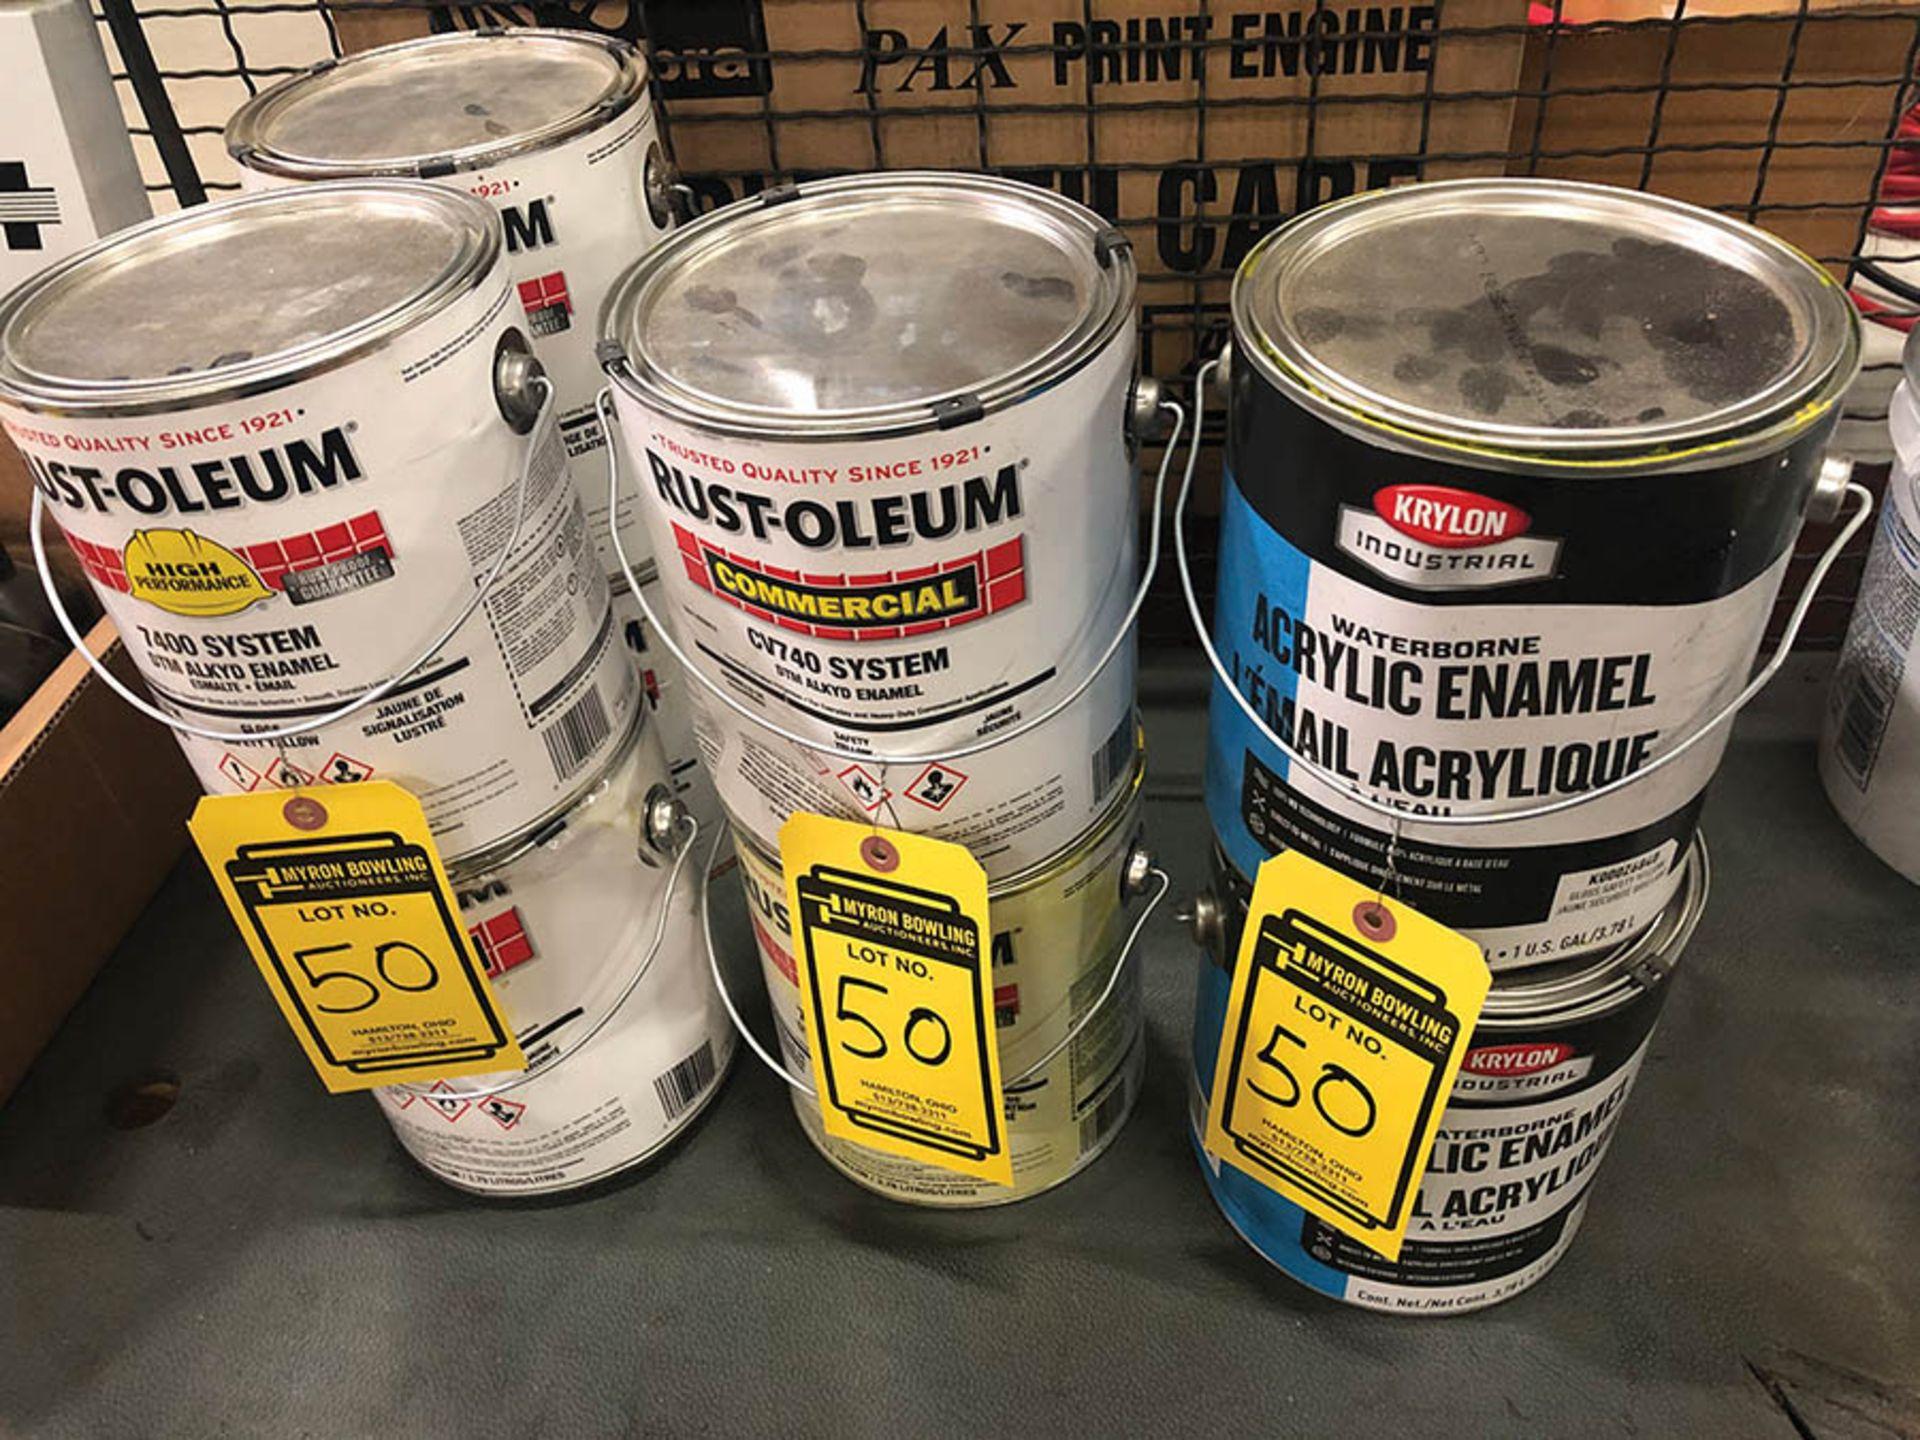 Lot 50 - (6) - 1 GALLON CANS OF RUST-OLIEUM DTM ALKYD ENAMEL AND (3) KRYLON 1 GALLON CANS OF ACRYLIC ENAMEL